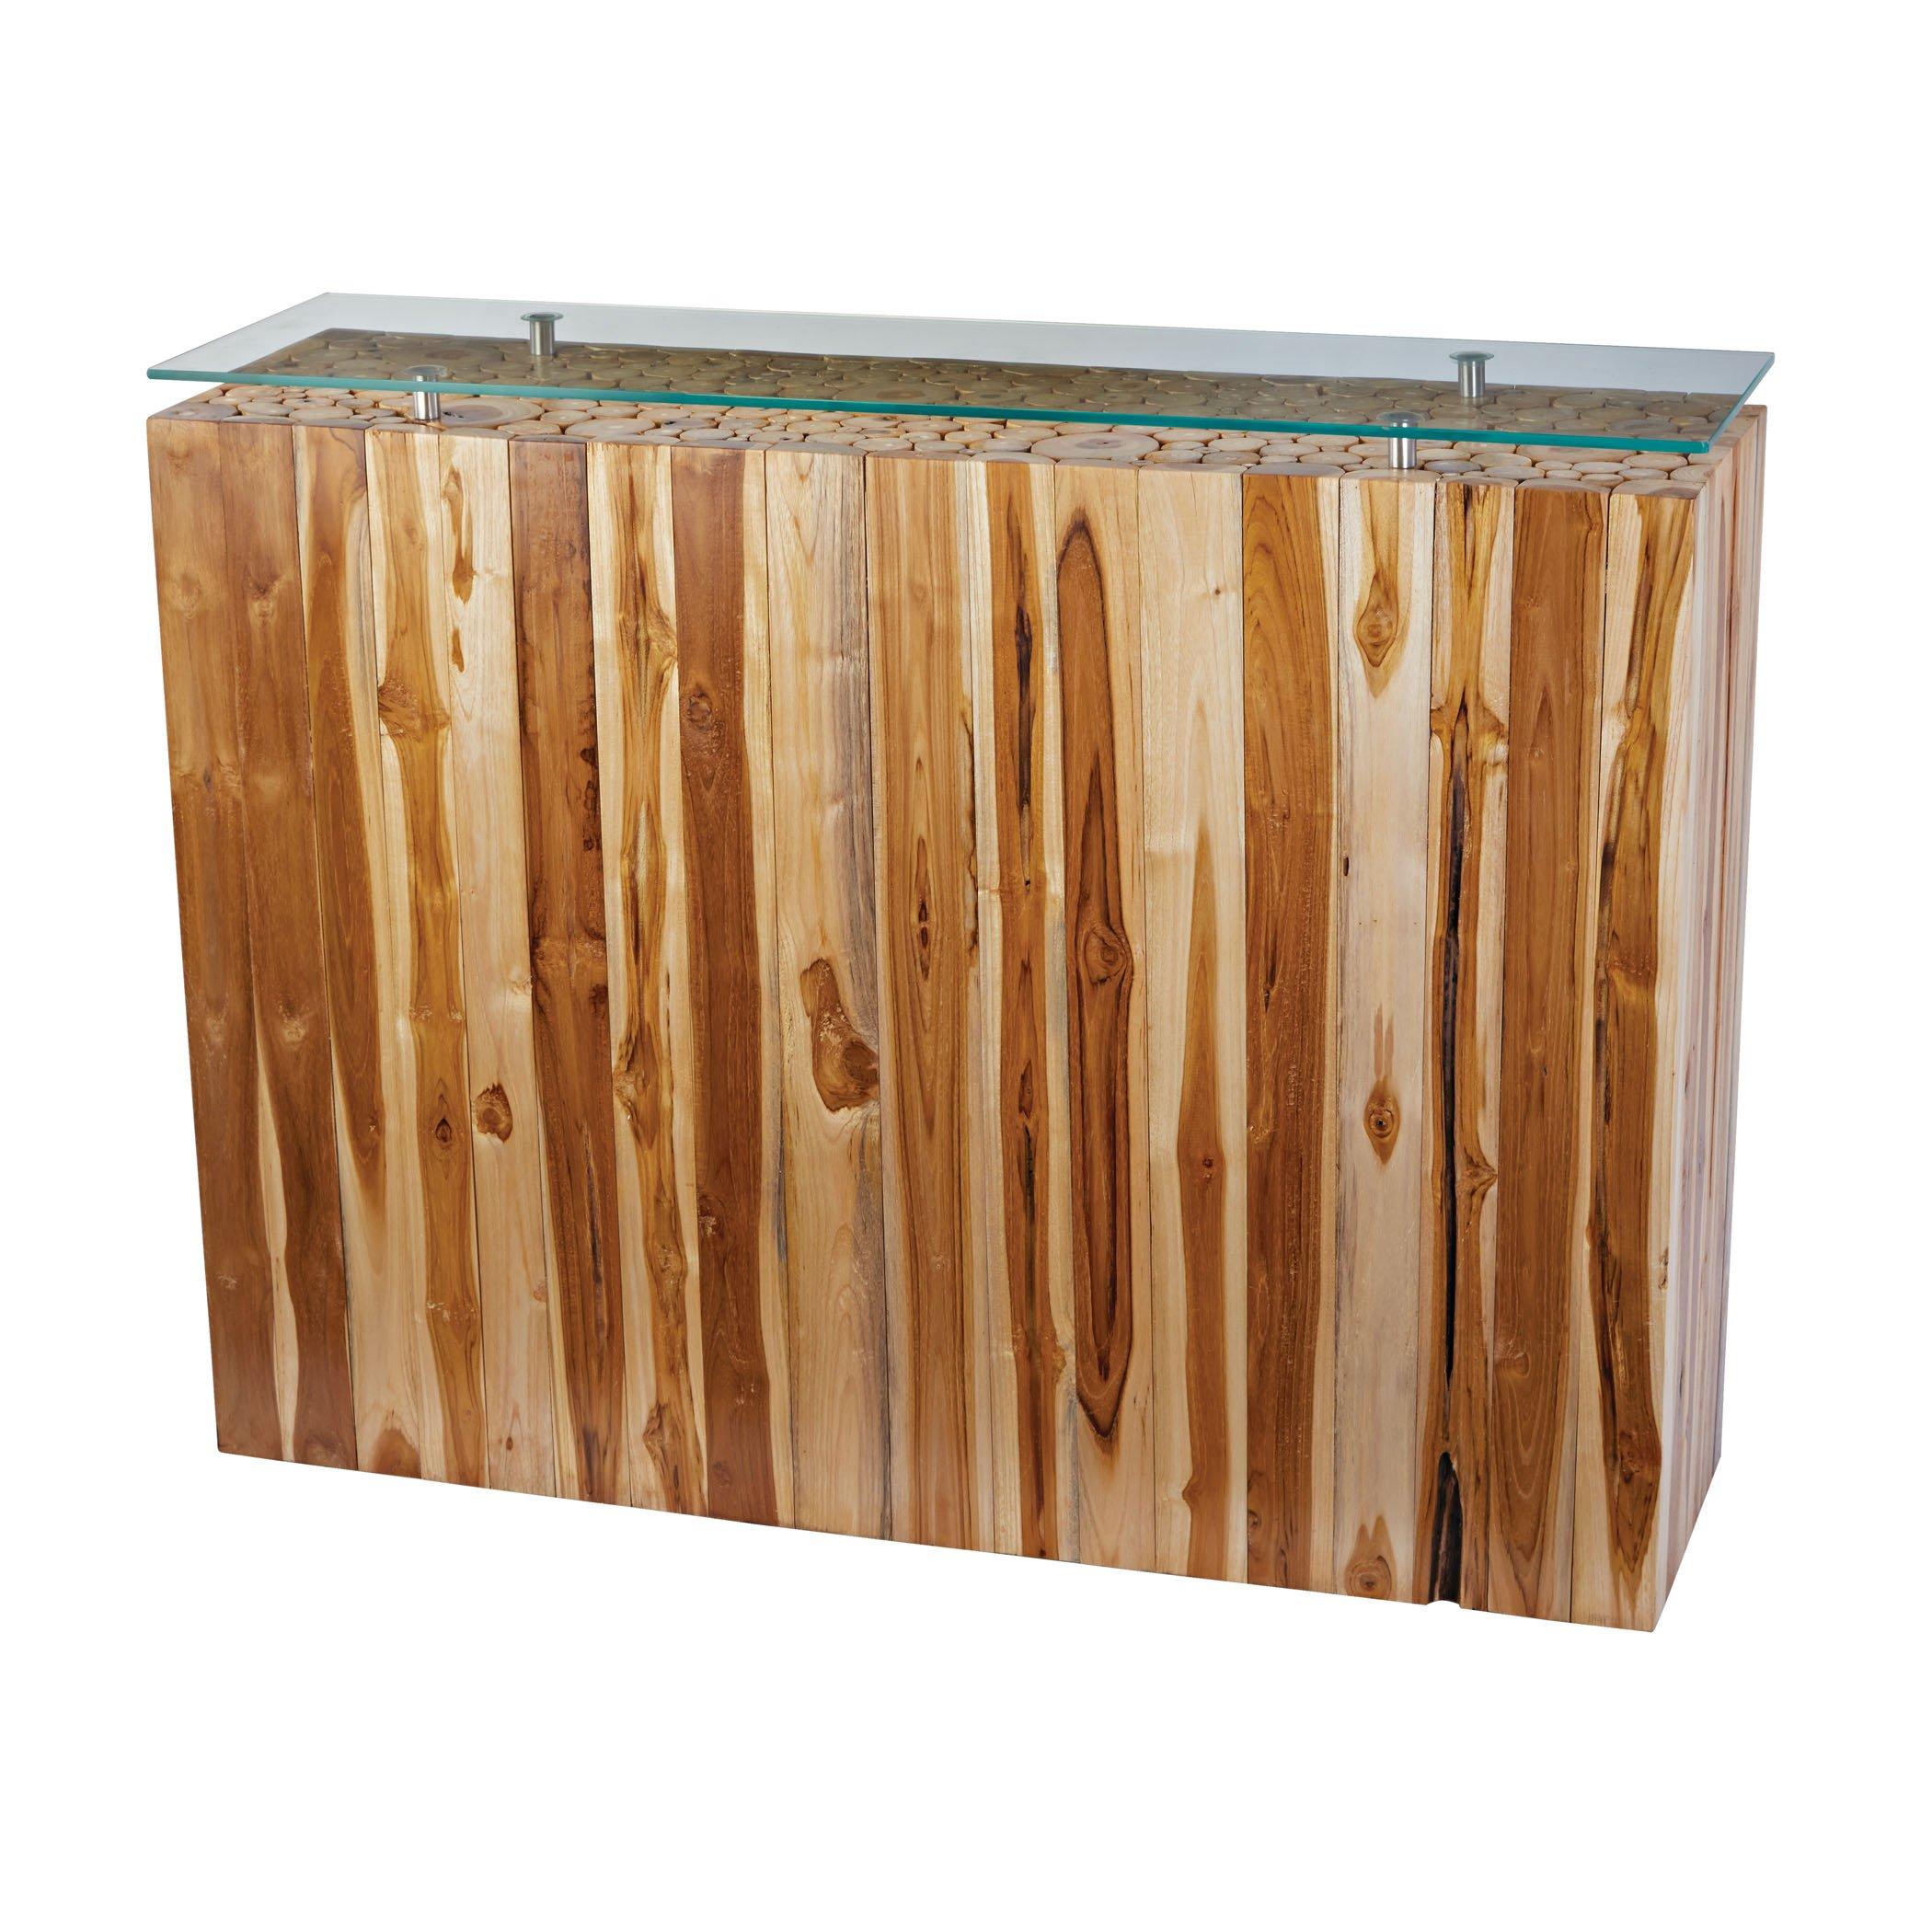 Dimond Home 162-029 Bundled Teak Root Console Table, 44'' x 12'' x 32''